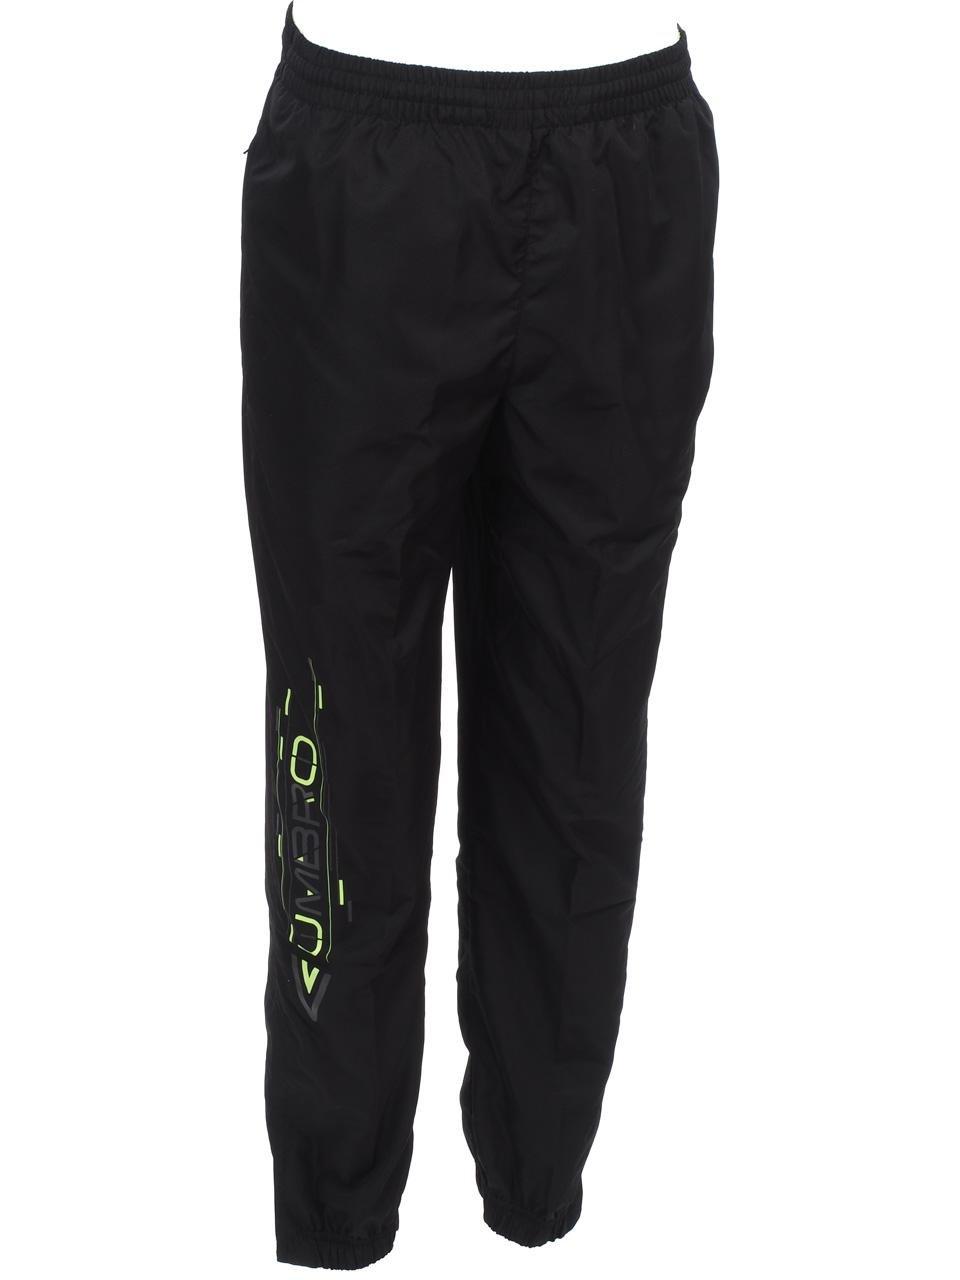 Umbro - Sr Woven negro pantsurvt - Pantalón de chándal, negro ...